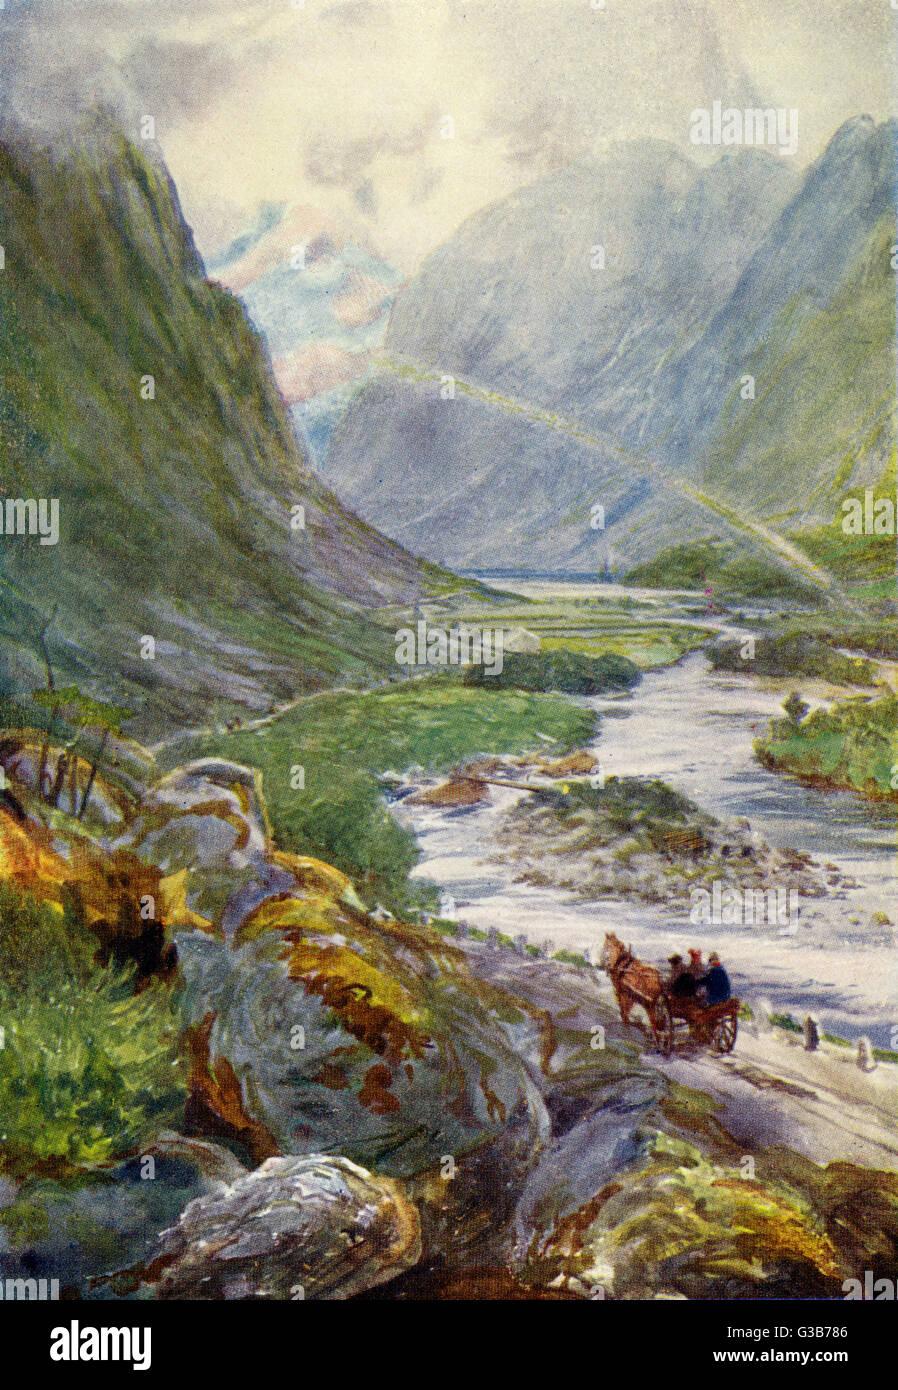 Naerodal: un paysage rocheux Date: 1909 Photo Stock